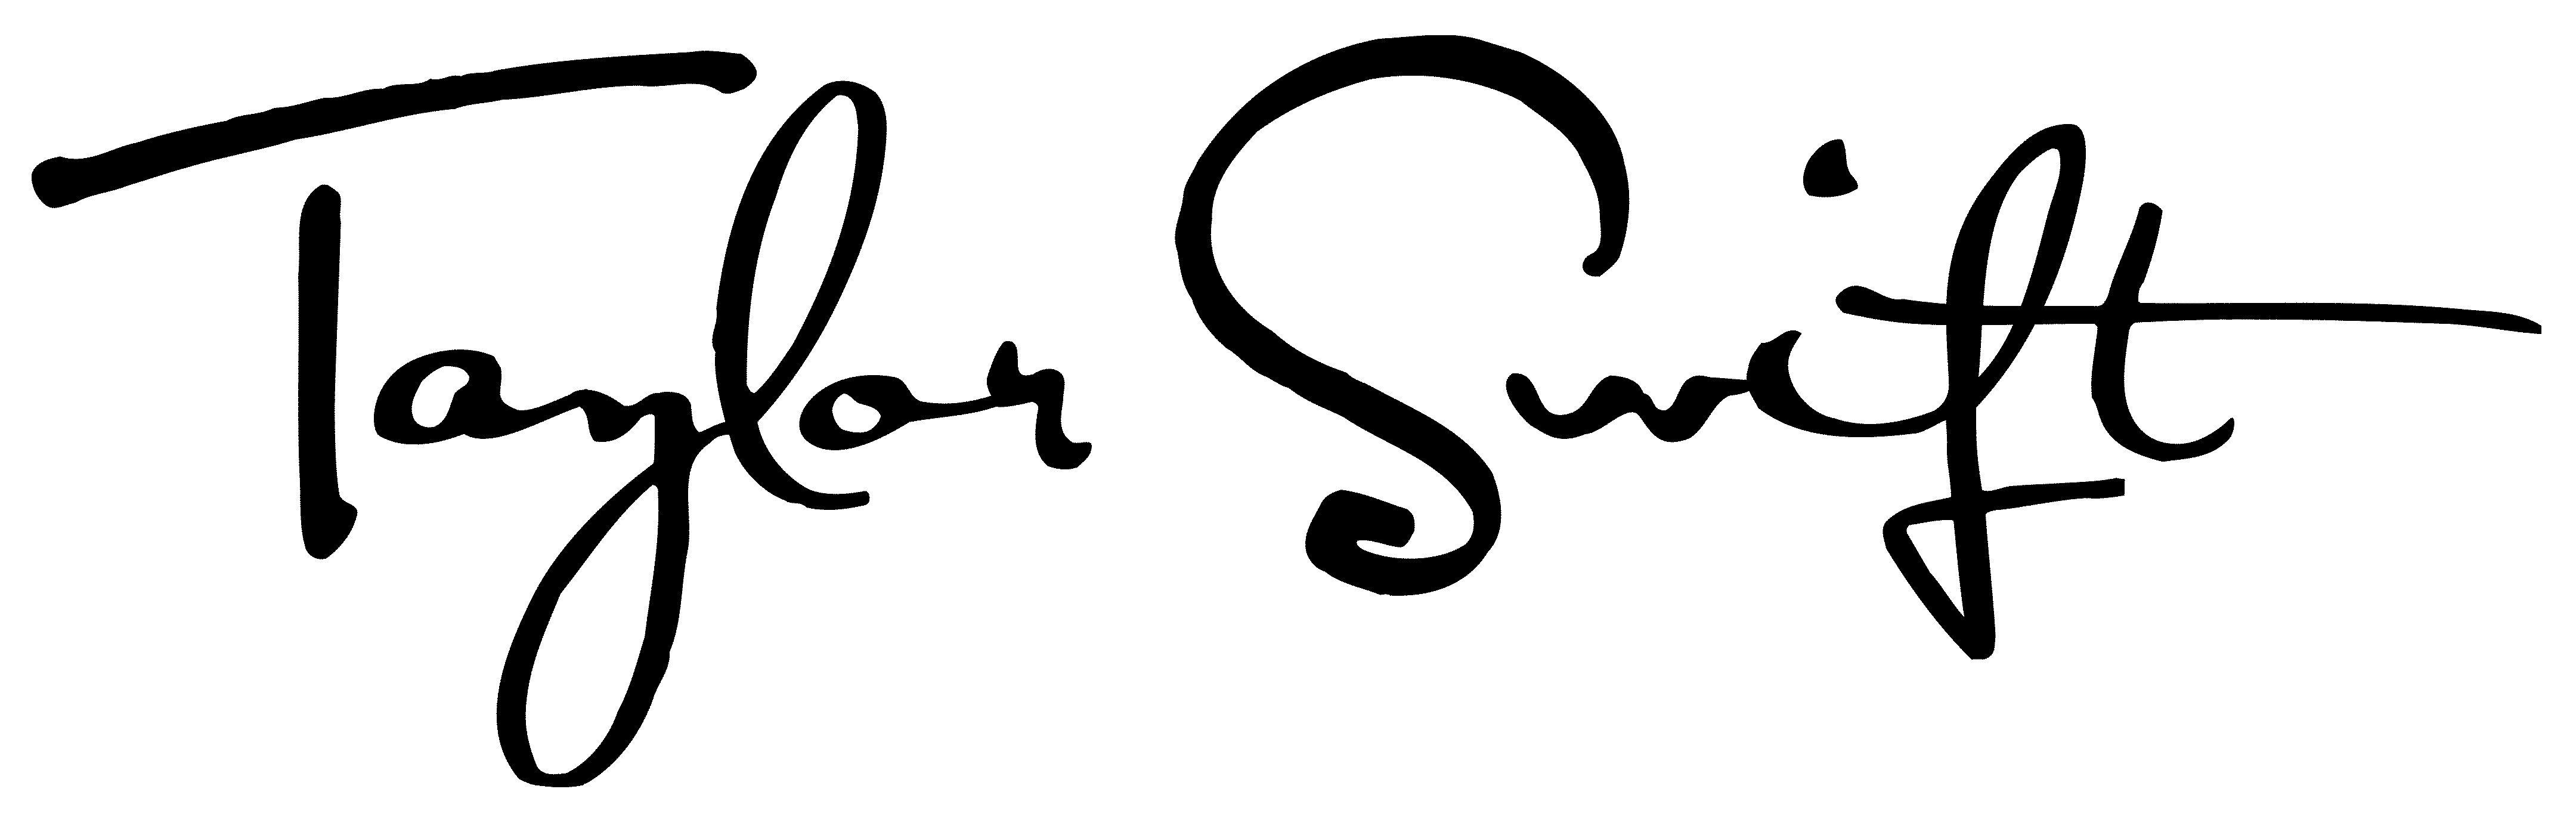 Writing Word Taylor ~ 【图片】【转】这个真心不错!!!长尾夹的其他用处!!!【河北师范大学吧】 百度贴吧